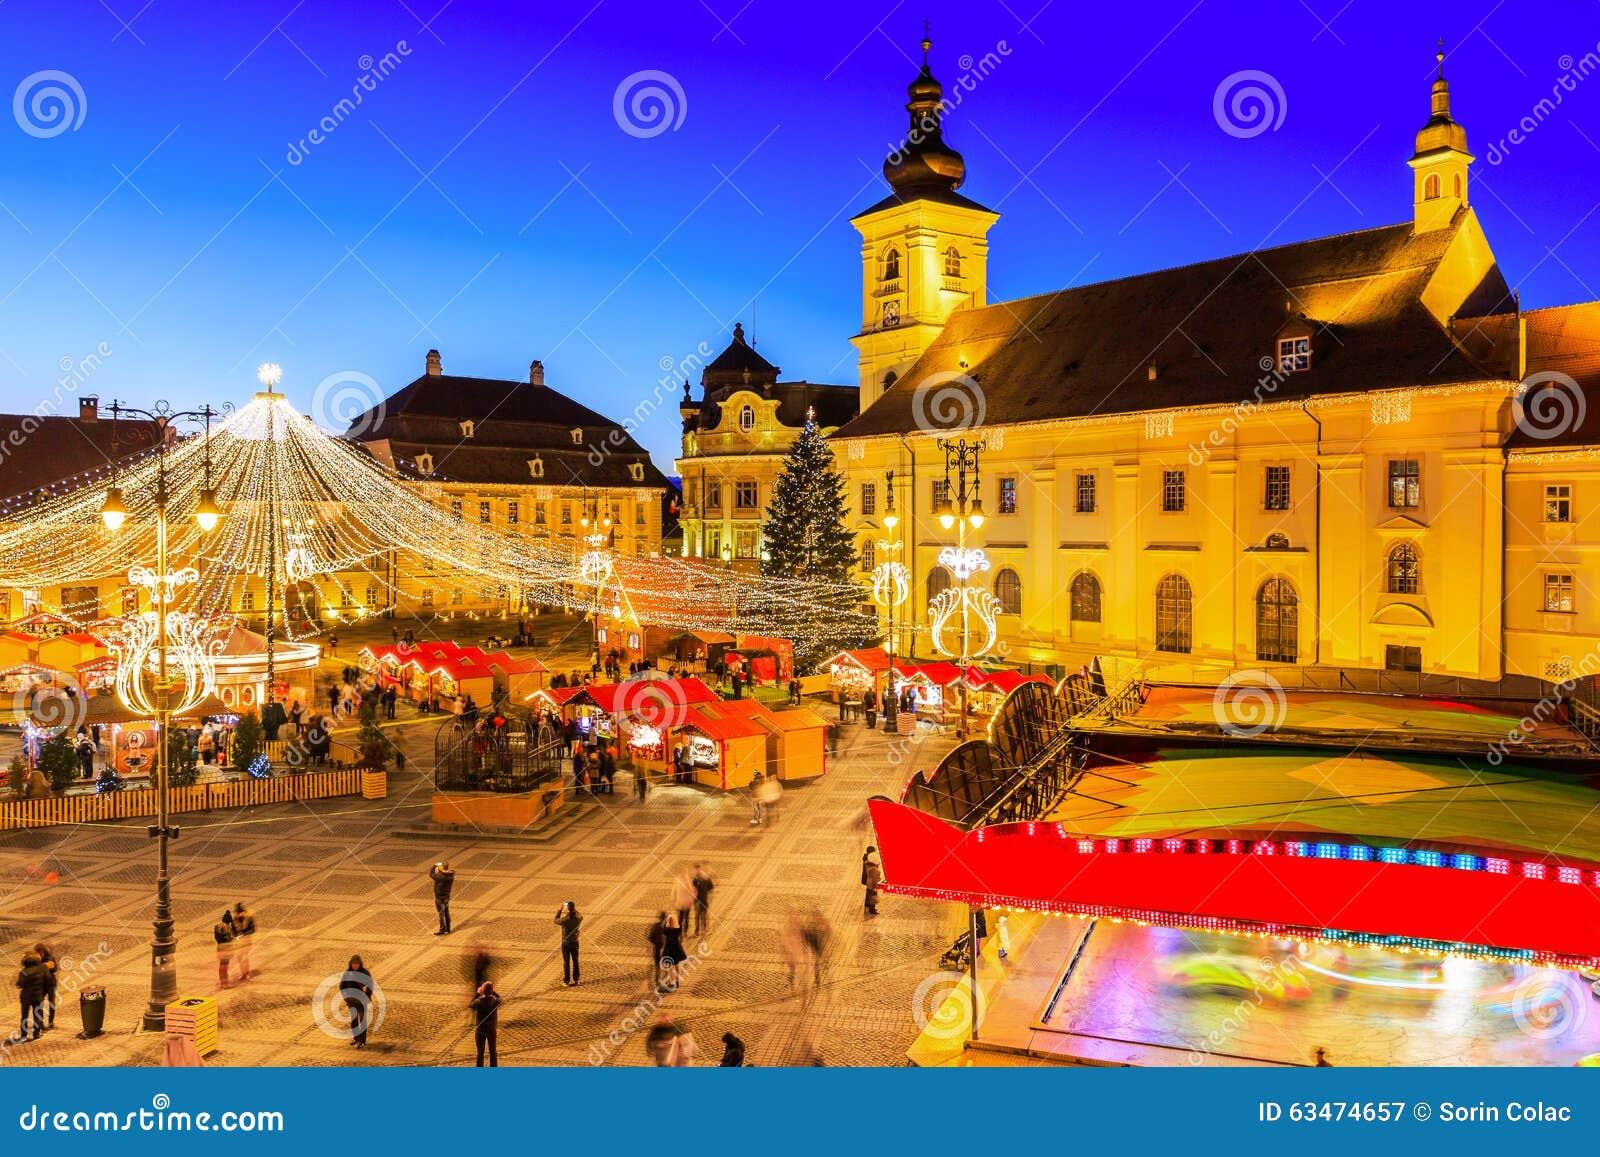 Sibiu, Transylvania. Romania. Christmas market in the Big Square ...